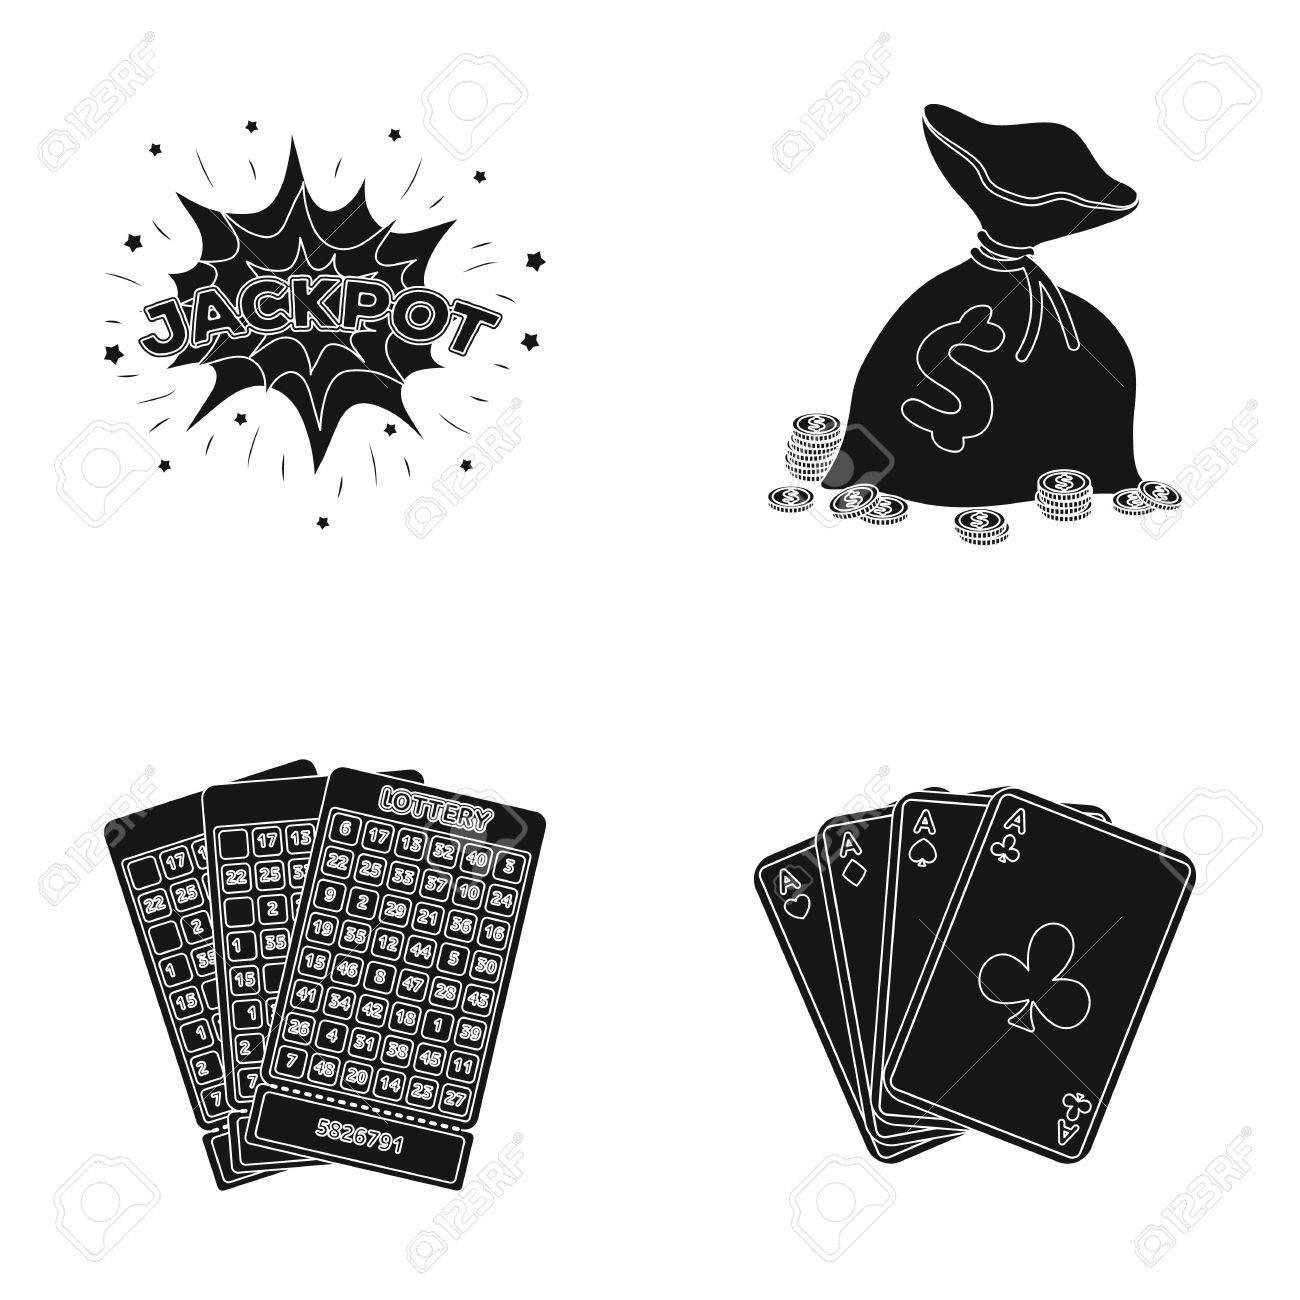 Win money playing bingo free